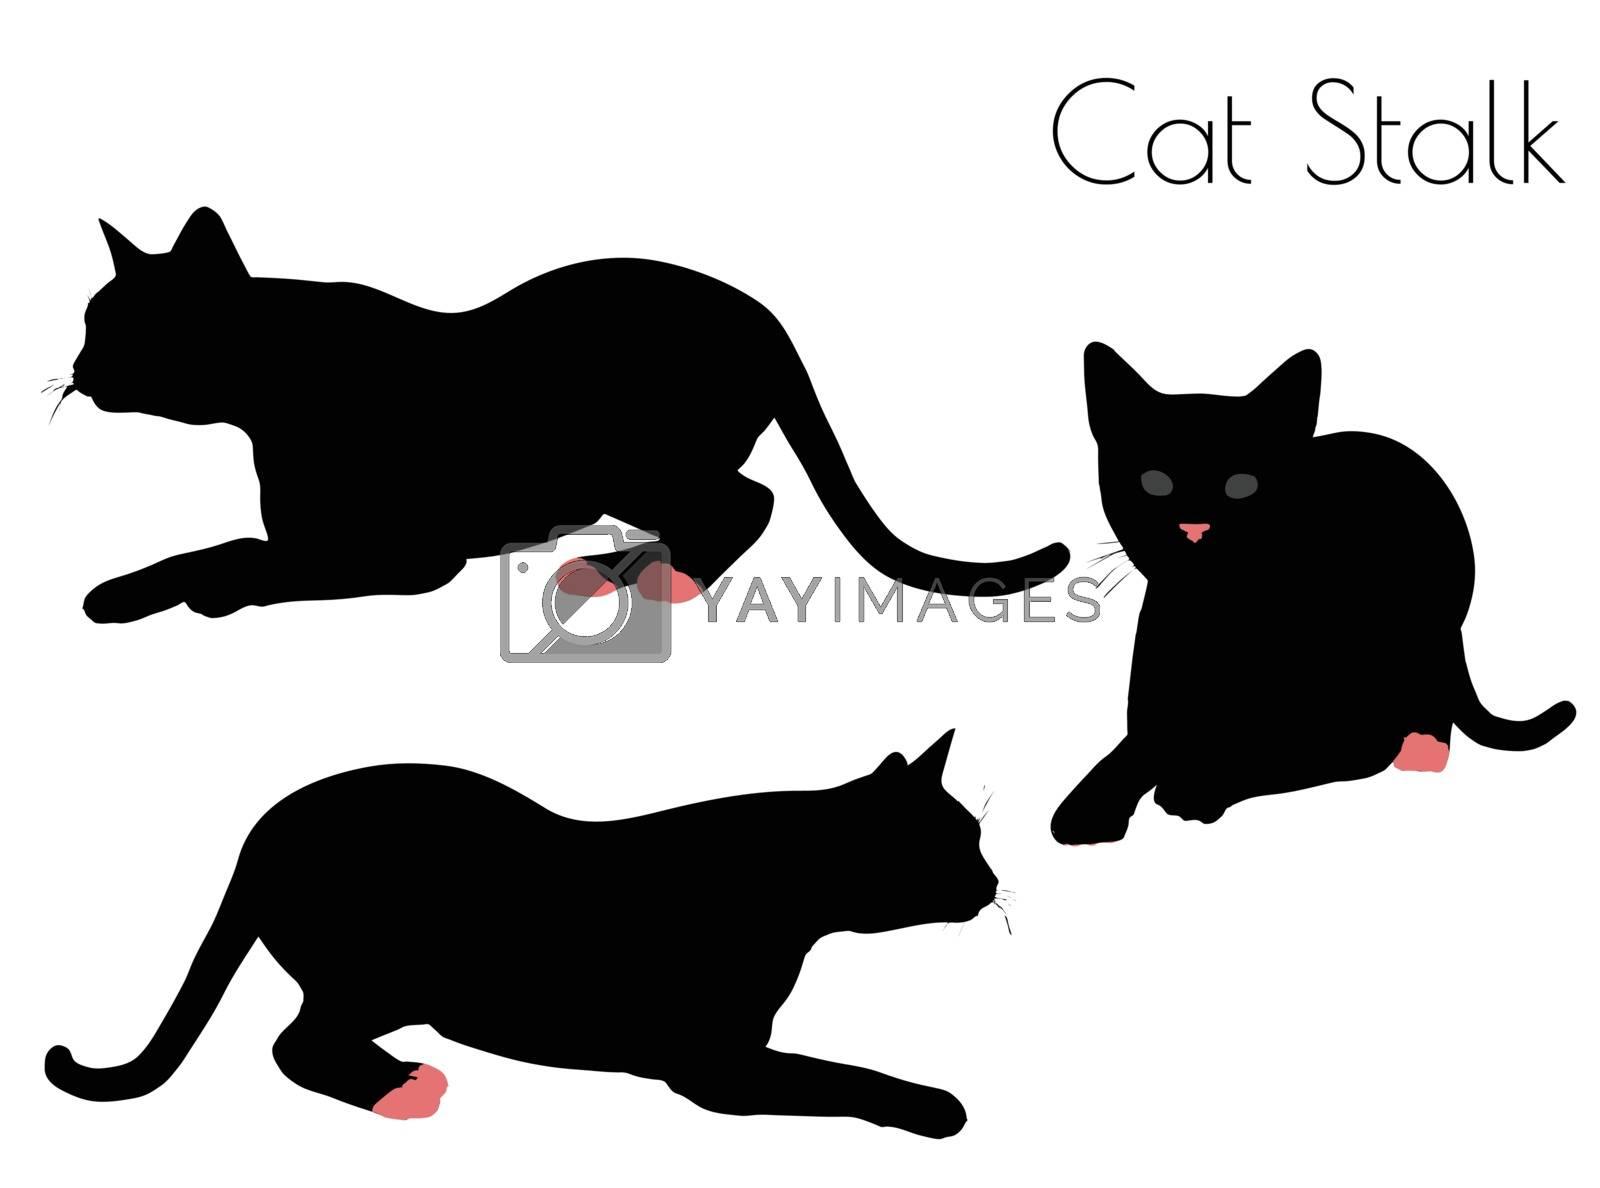 EPS 10 vector illustration of cat silhouette in Stalk Pose